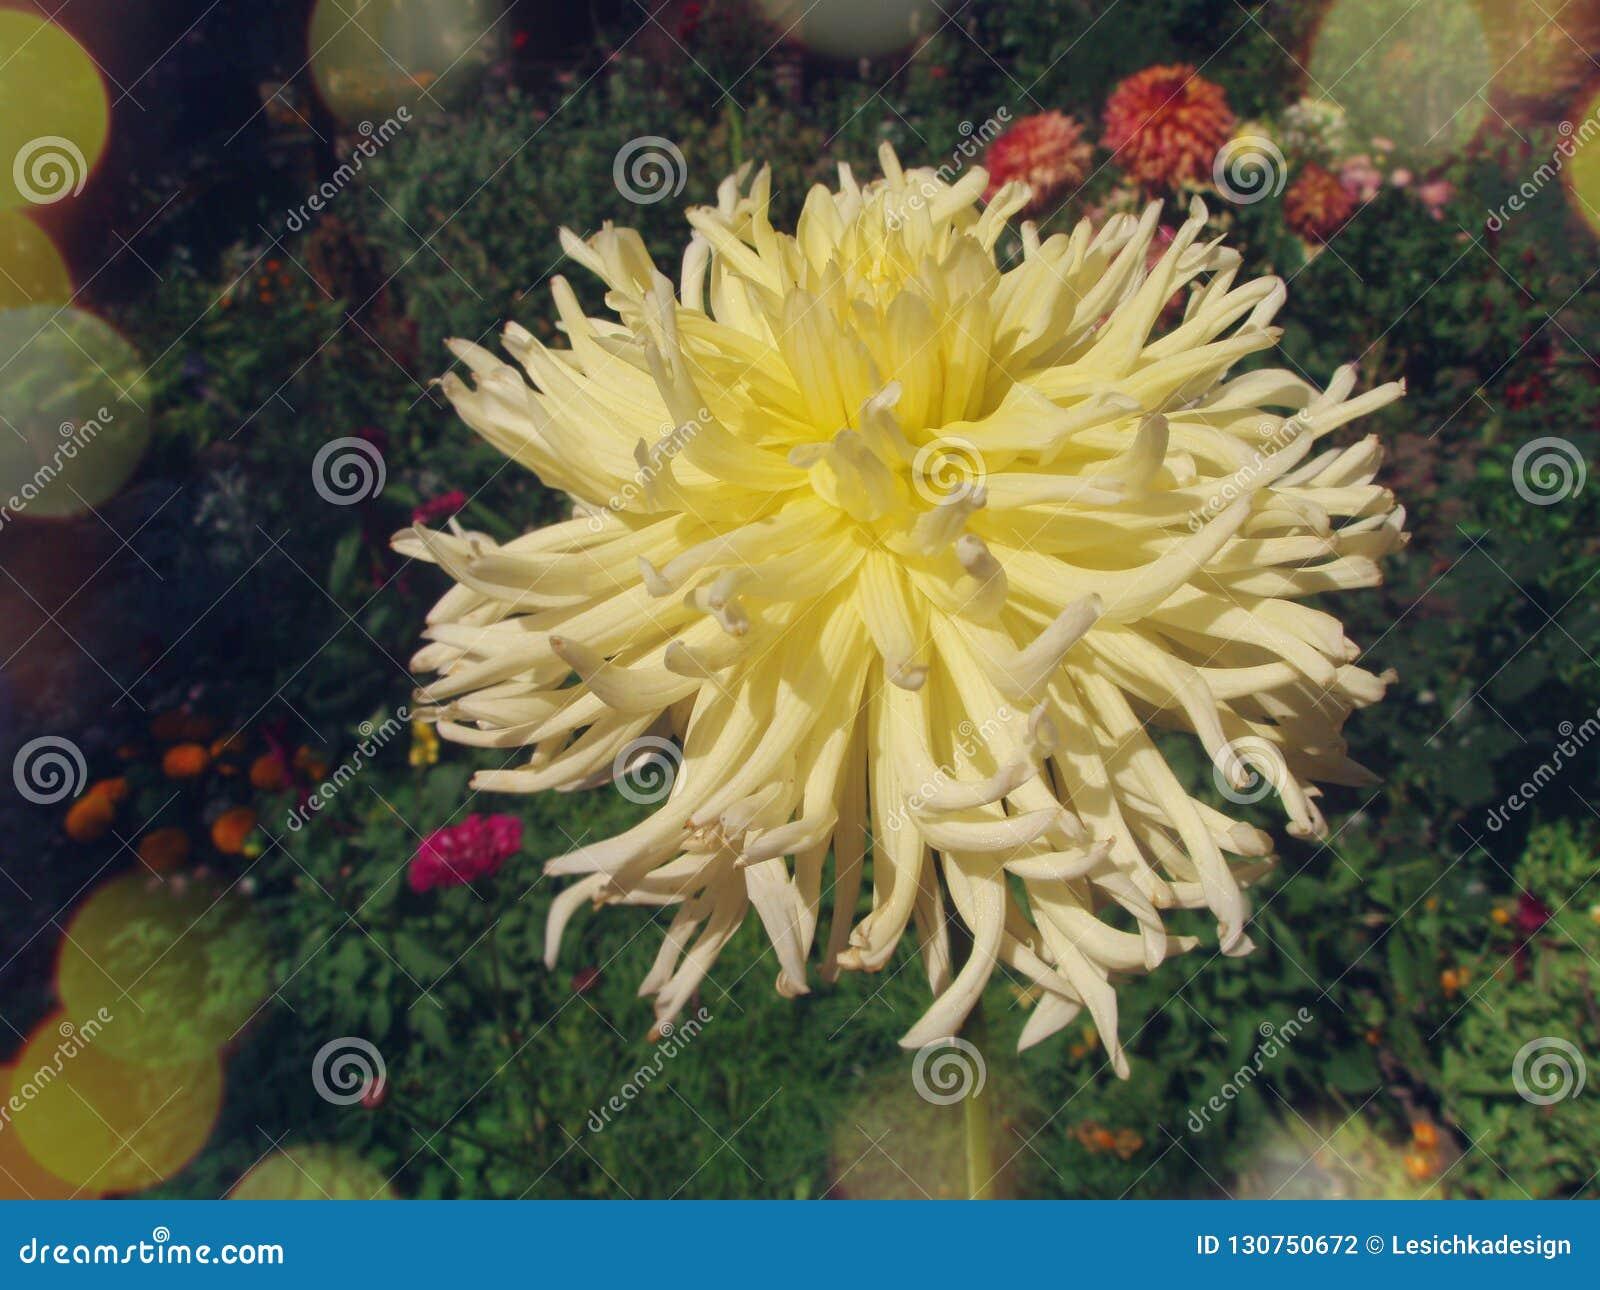 Dahlia Flower Yellow Star Tuberous Rooted Perennial Dahlia Stock